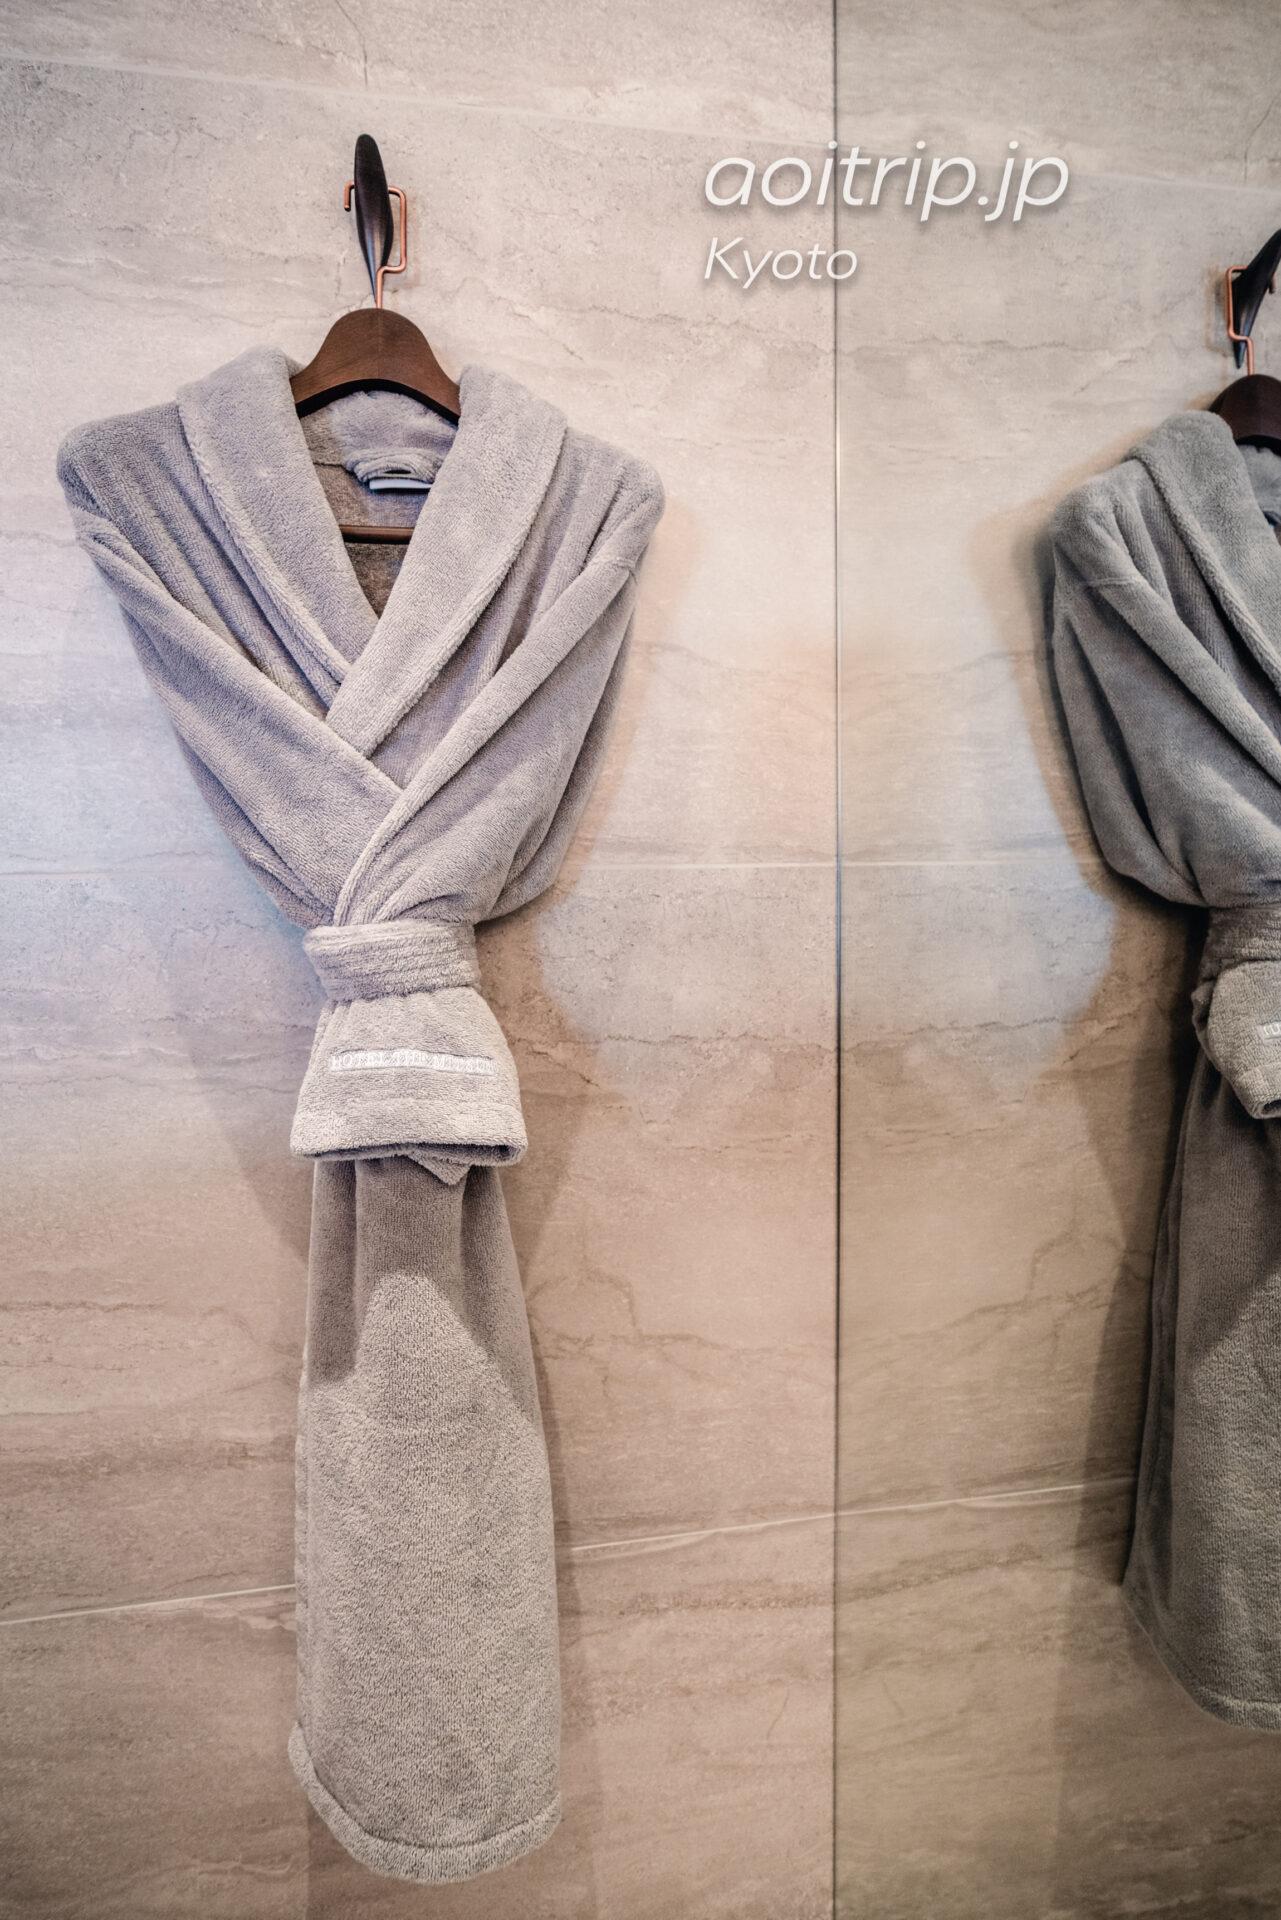 HOTEL THE MITSUI KYOTOのバスローブ